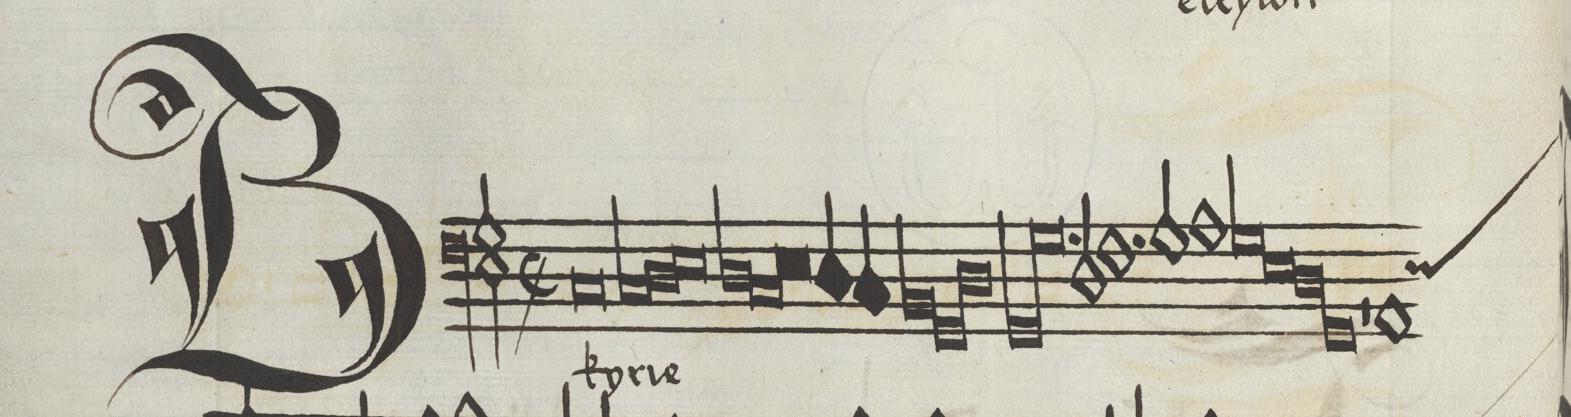 kyrie manuscript